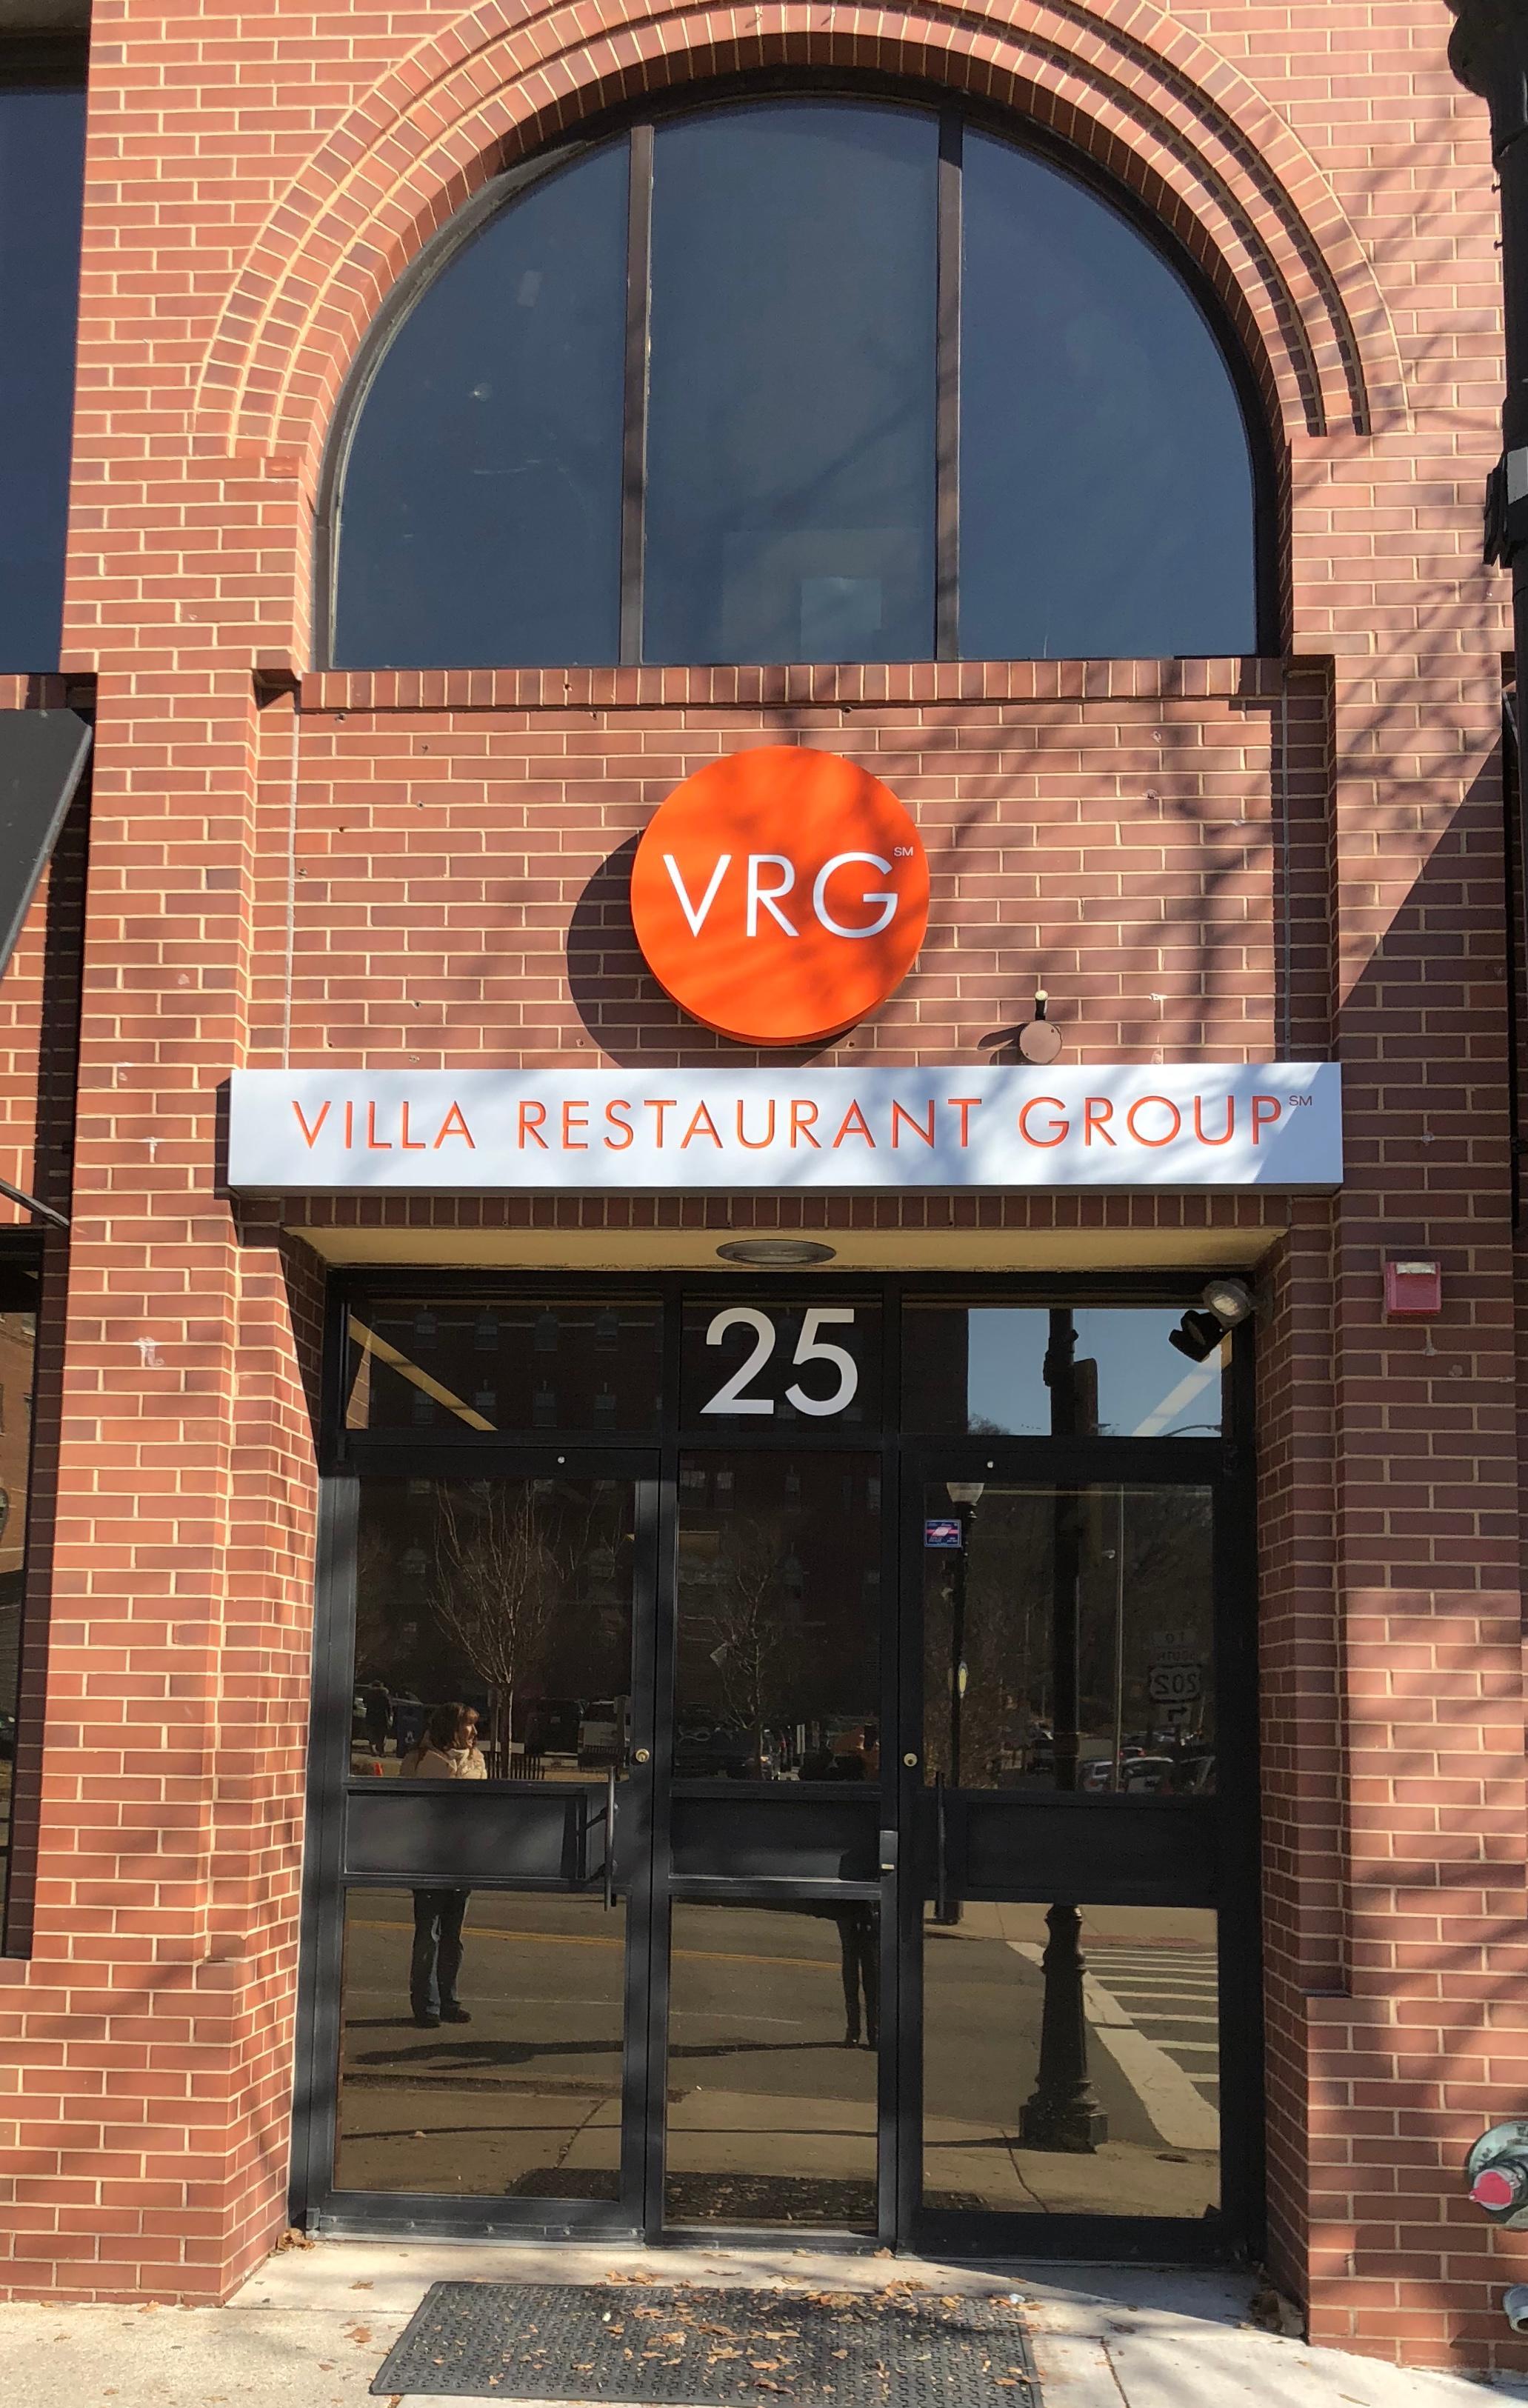 Villa Restaurant Group image 1